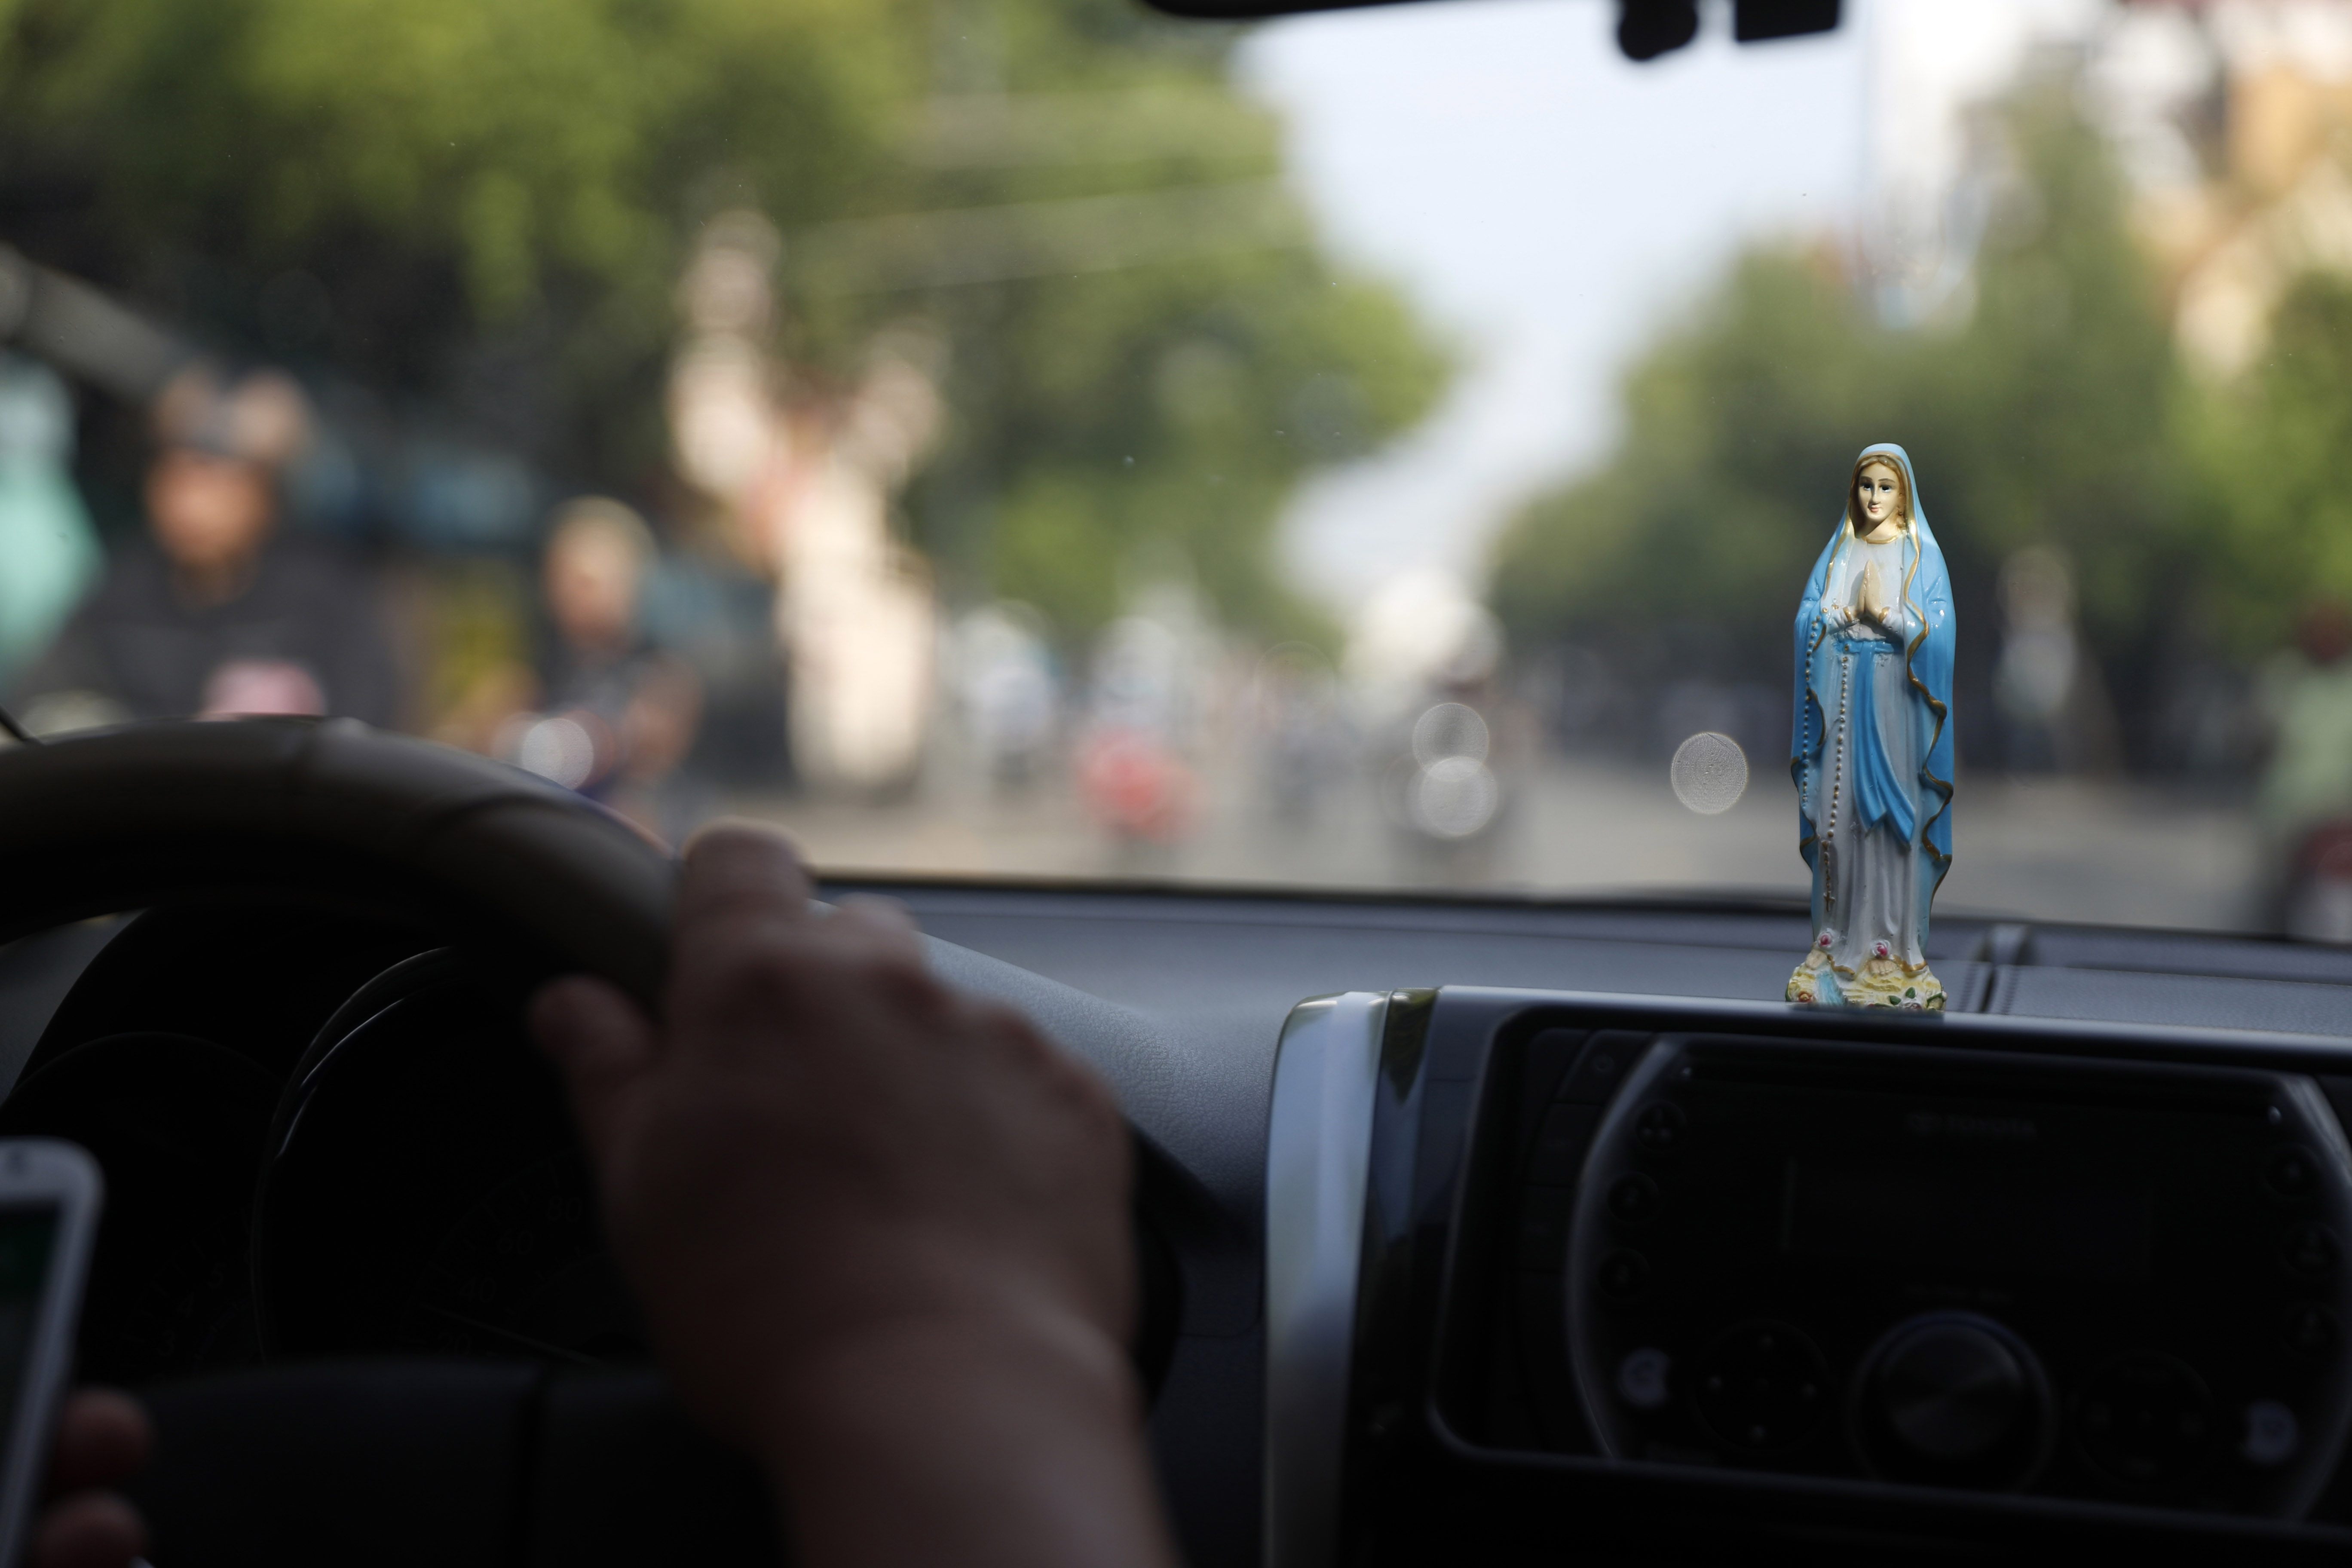 Statue Vierge Marie dans une voiture